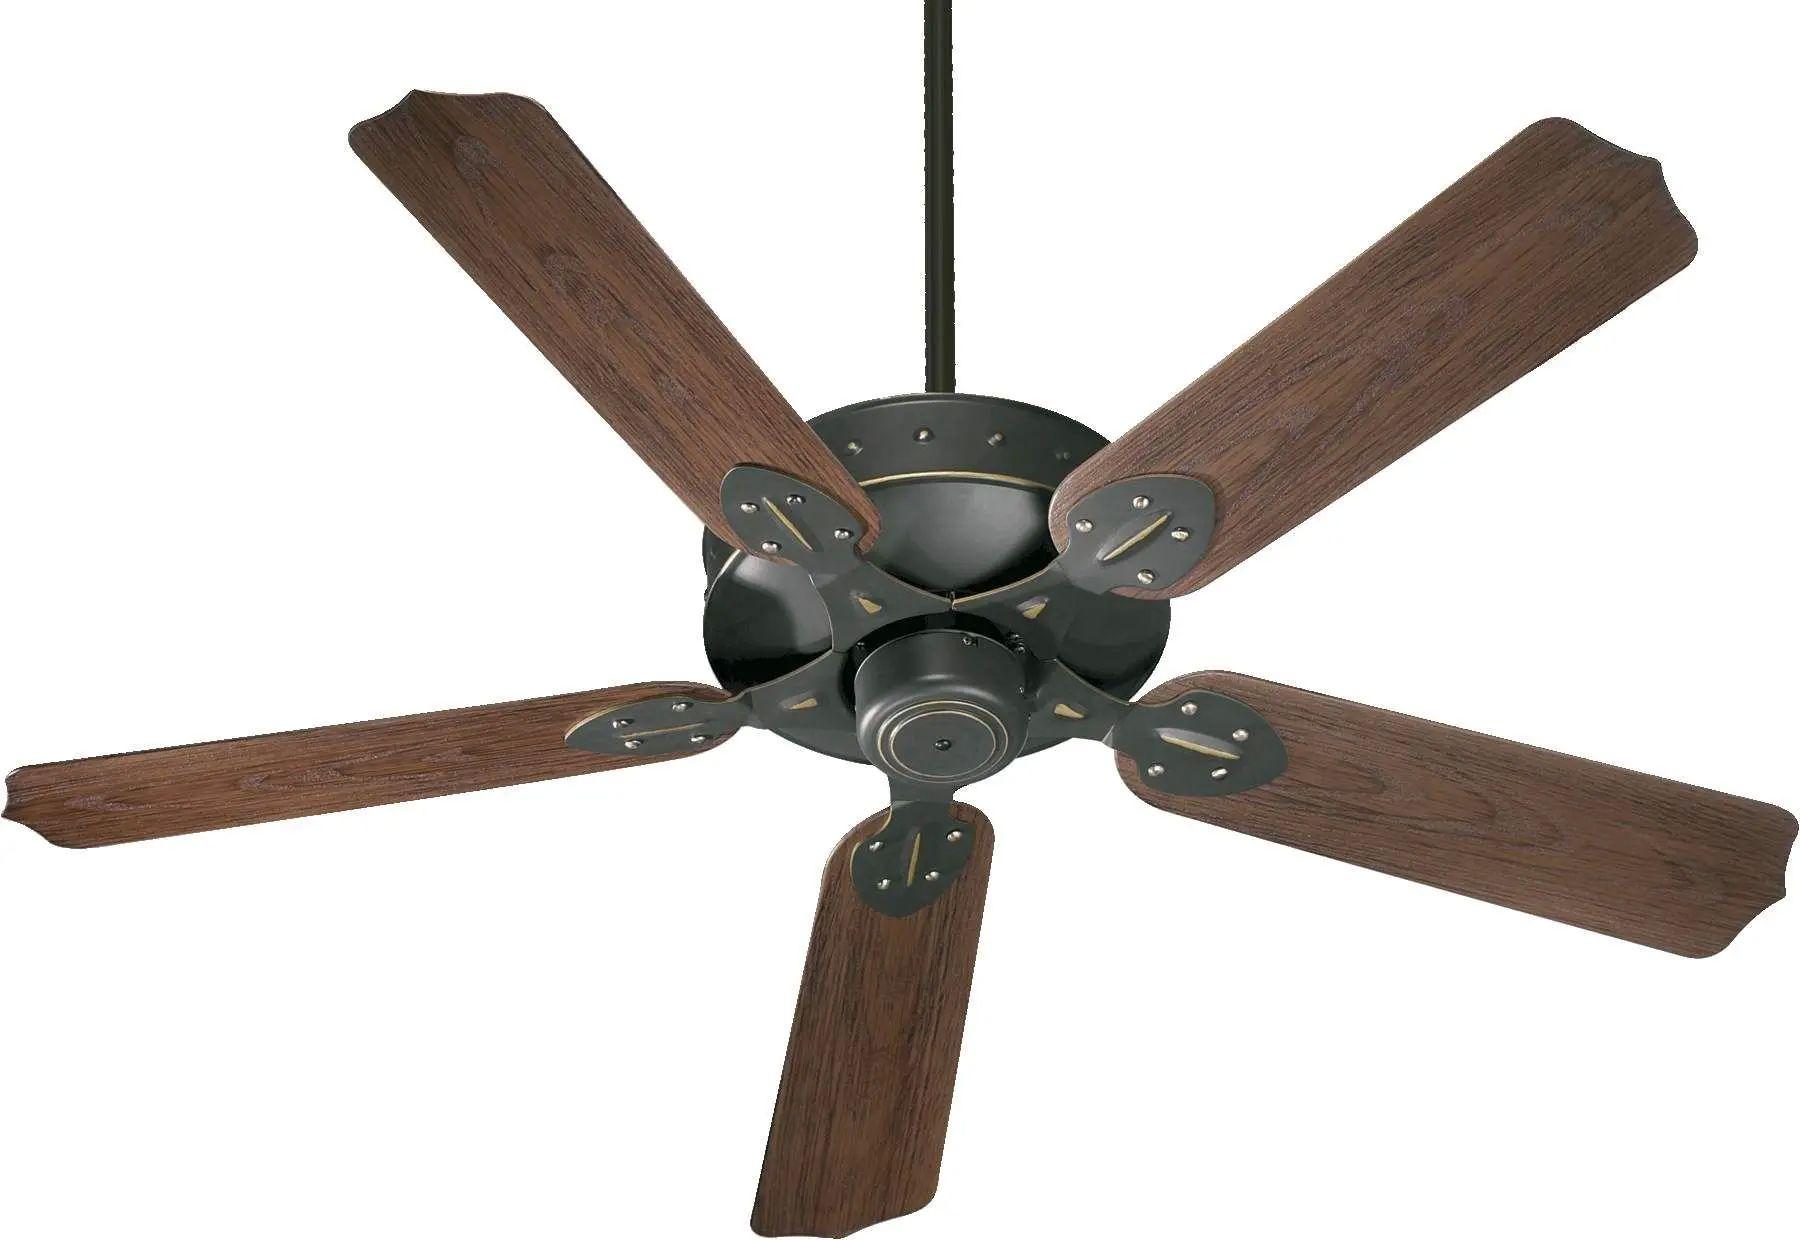 Quorum Hudson Patio Ceiling Fan in Old World